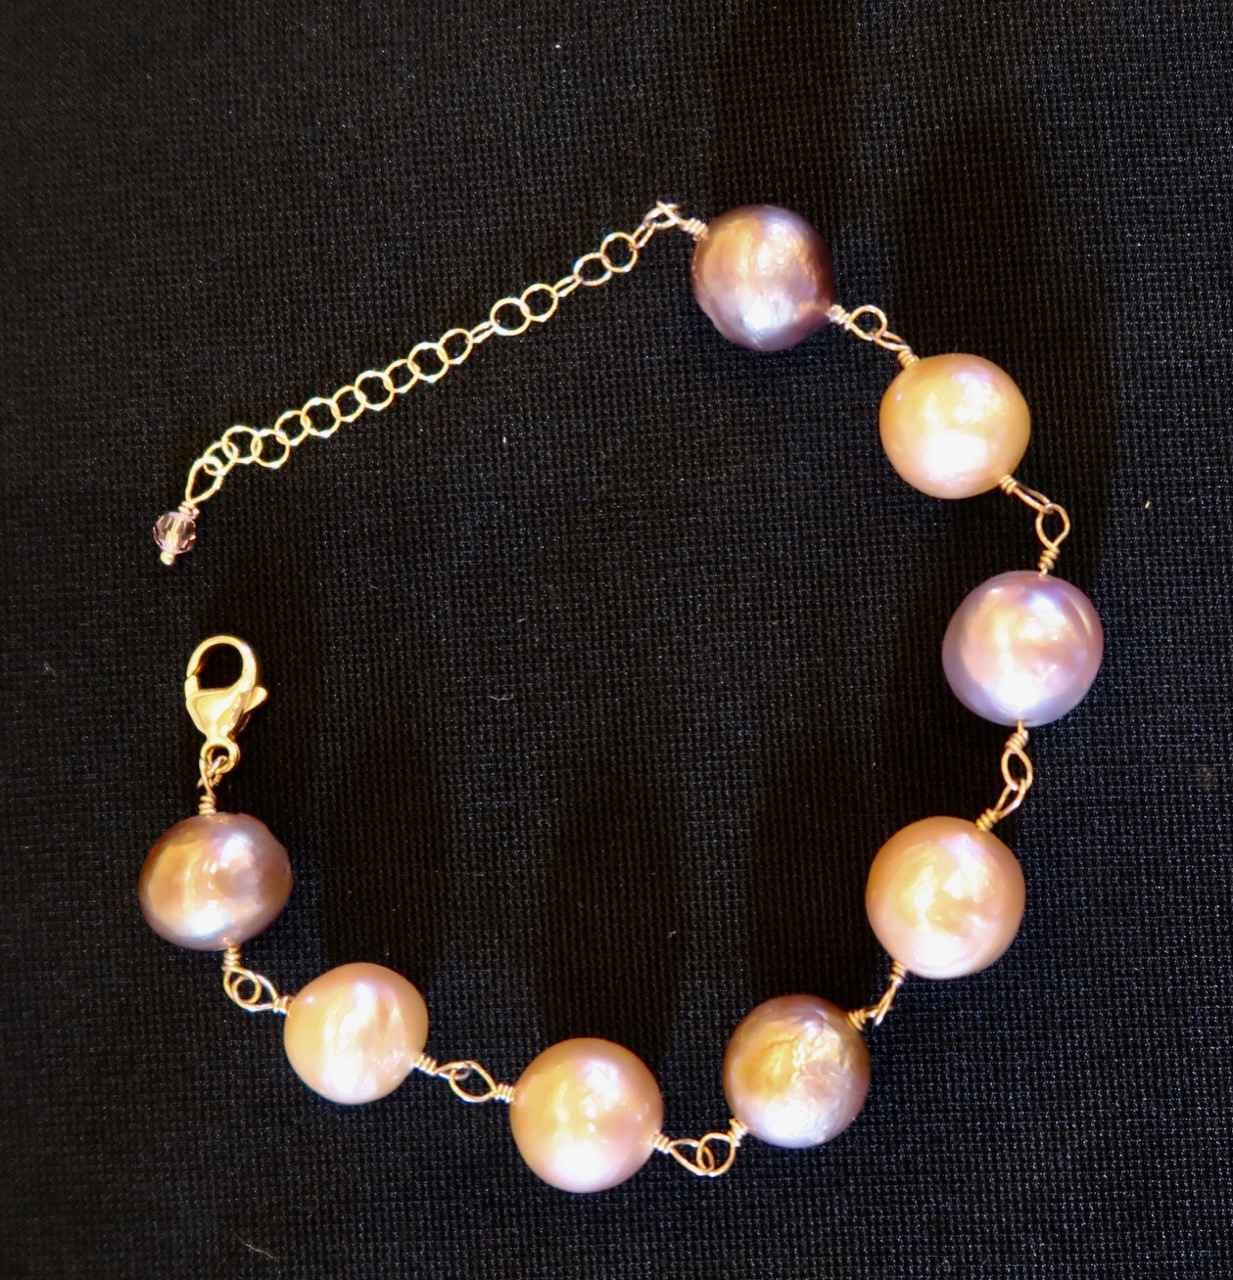 Edisen Pearl & Amethy... by Mrs. Rebecca Mach - Masterpiece Online